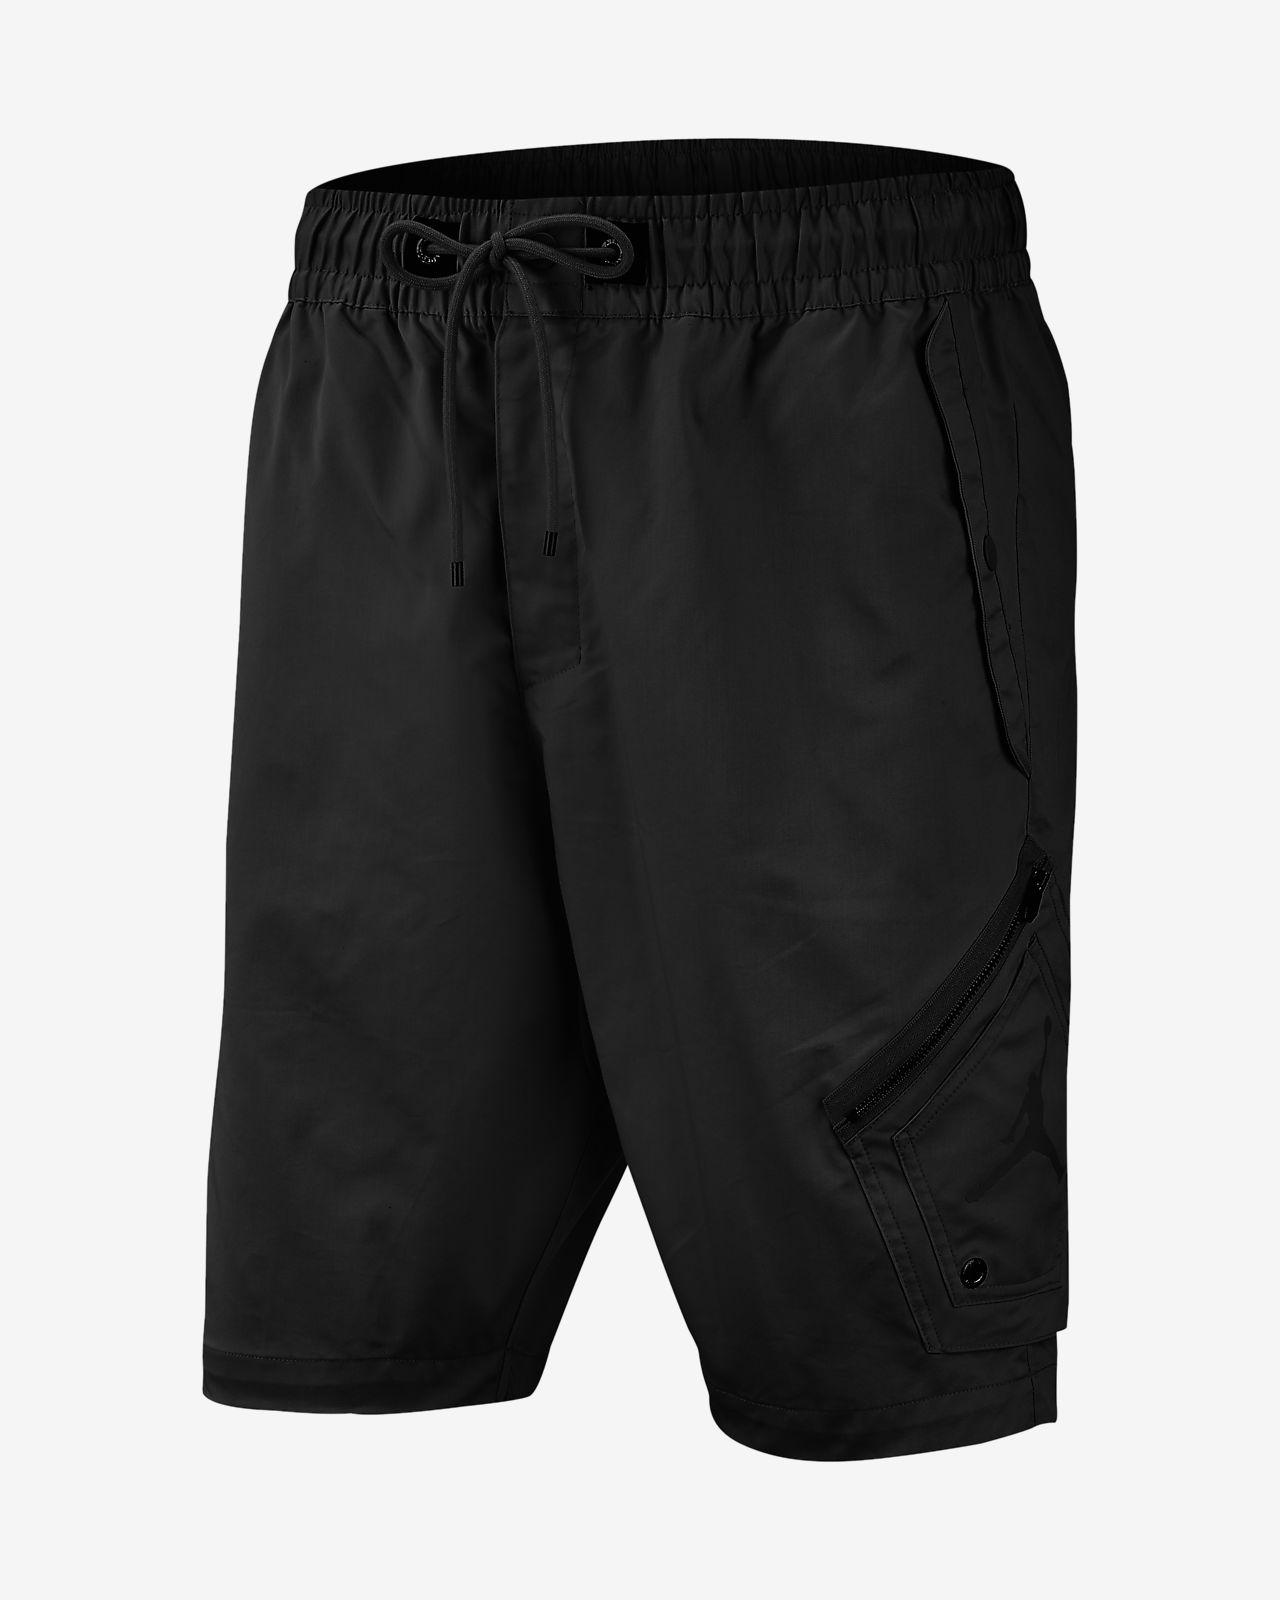 Jordan Wings Pocket 男款梭織短褲